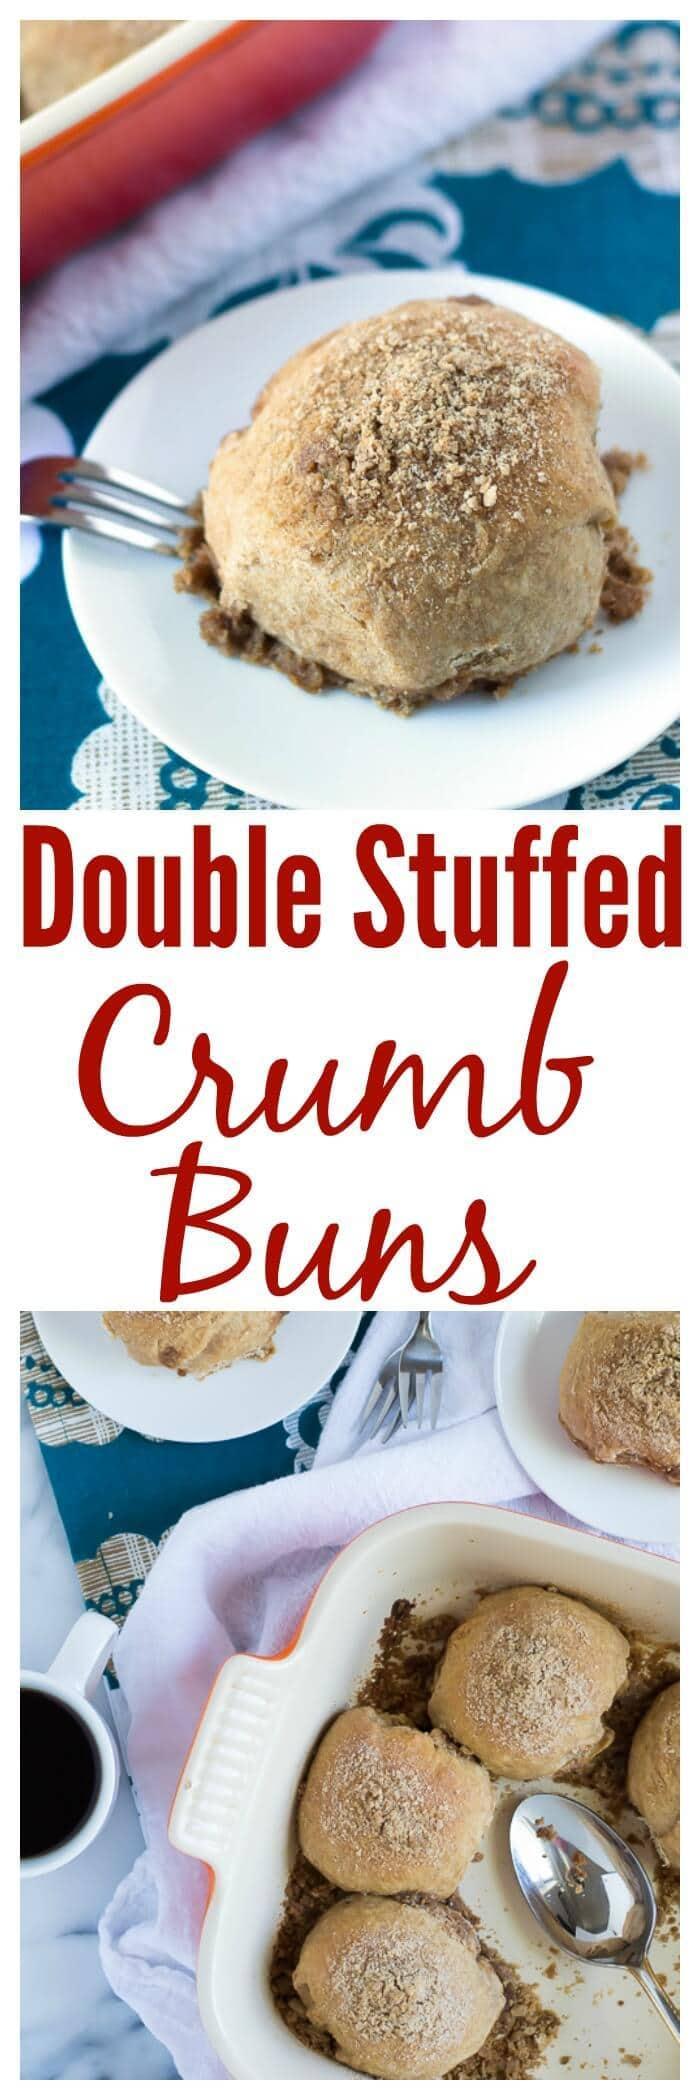 Double Stuffed Crumb Buns